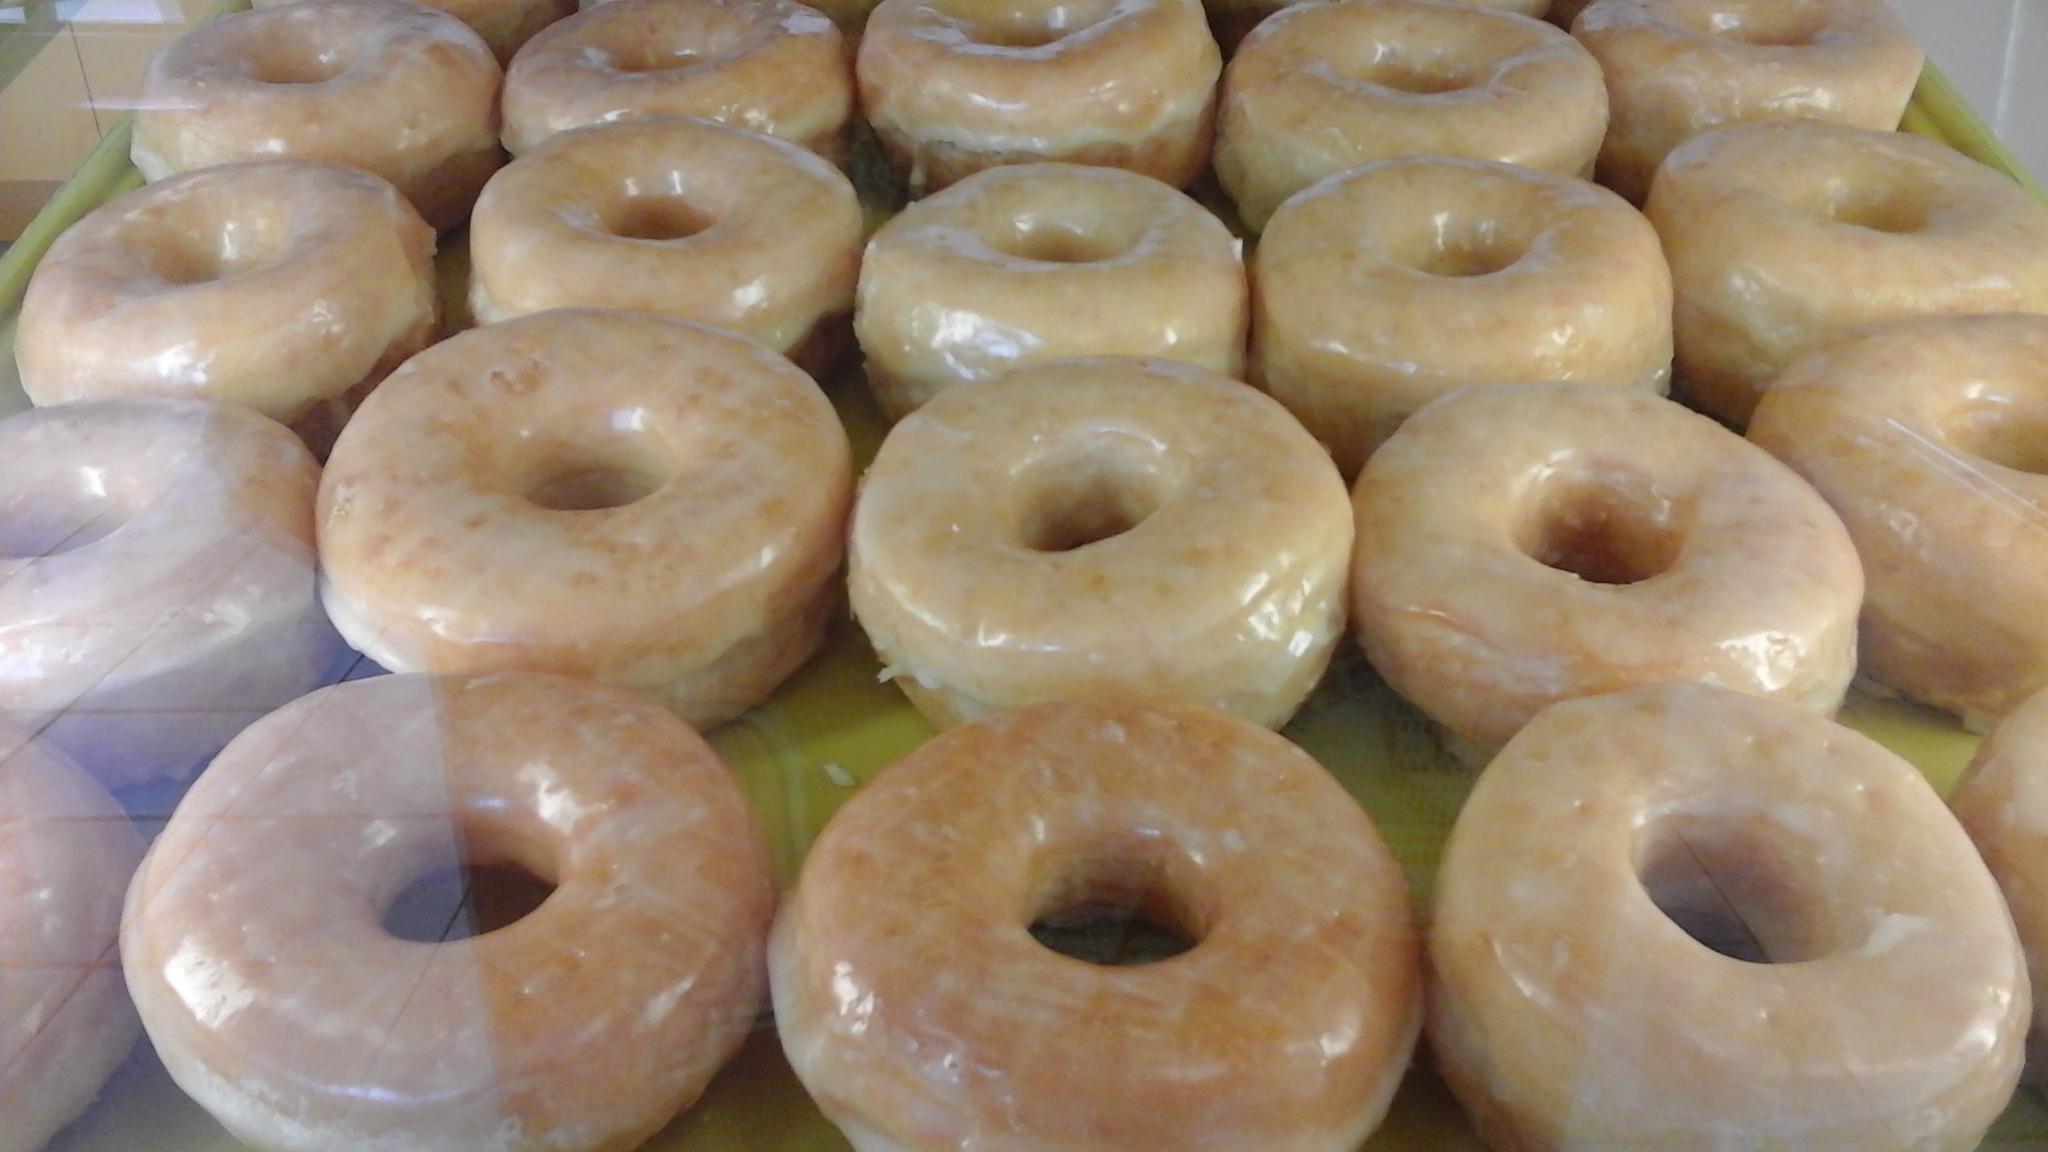 Daylight Donuts image 1